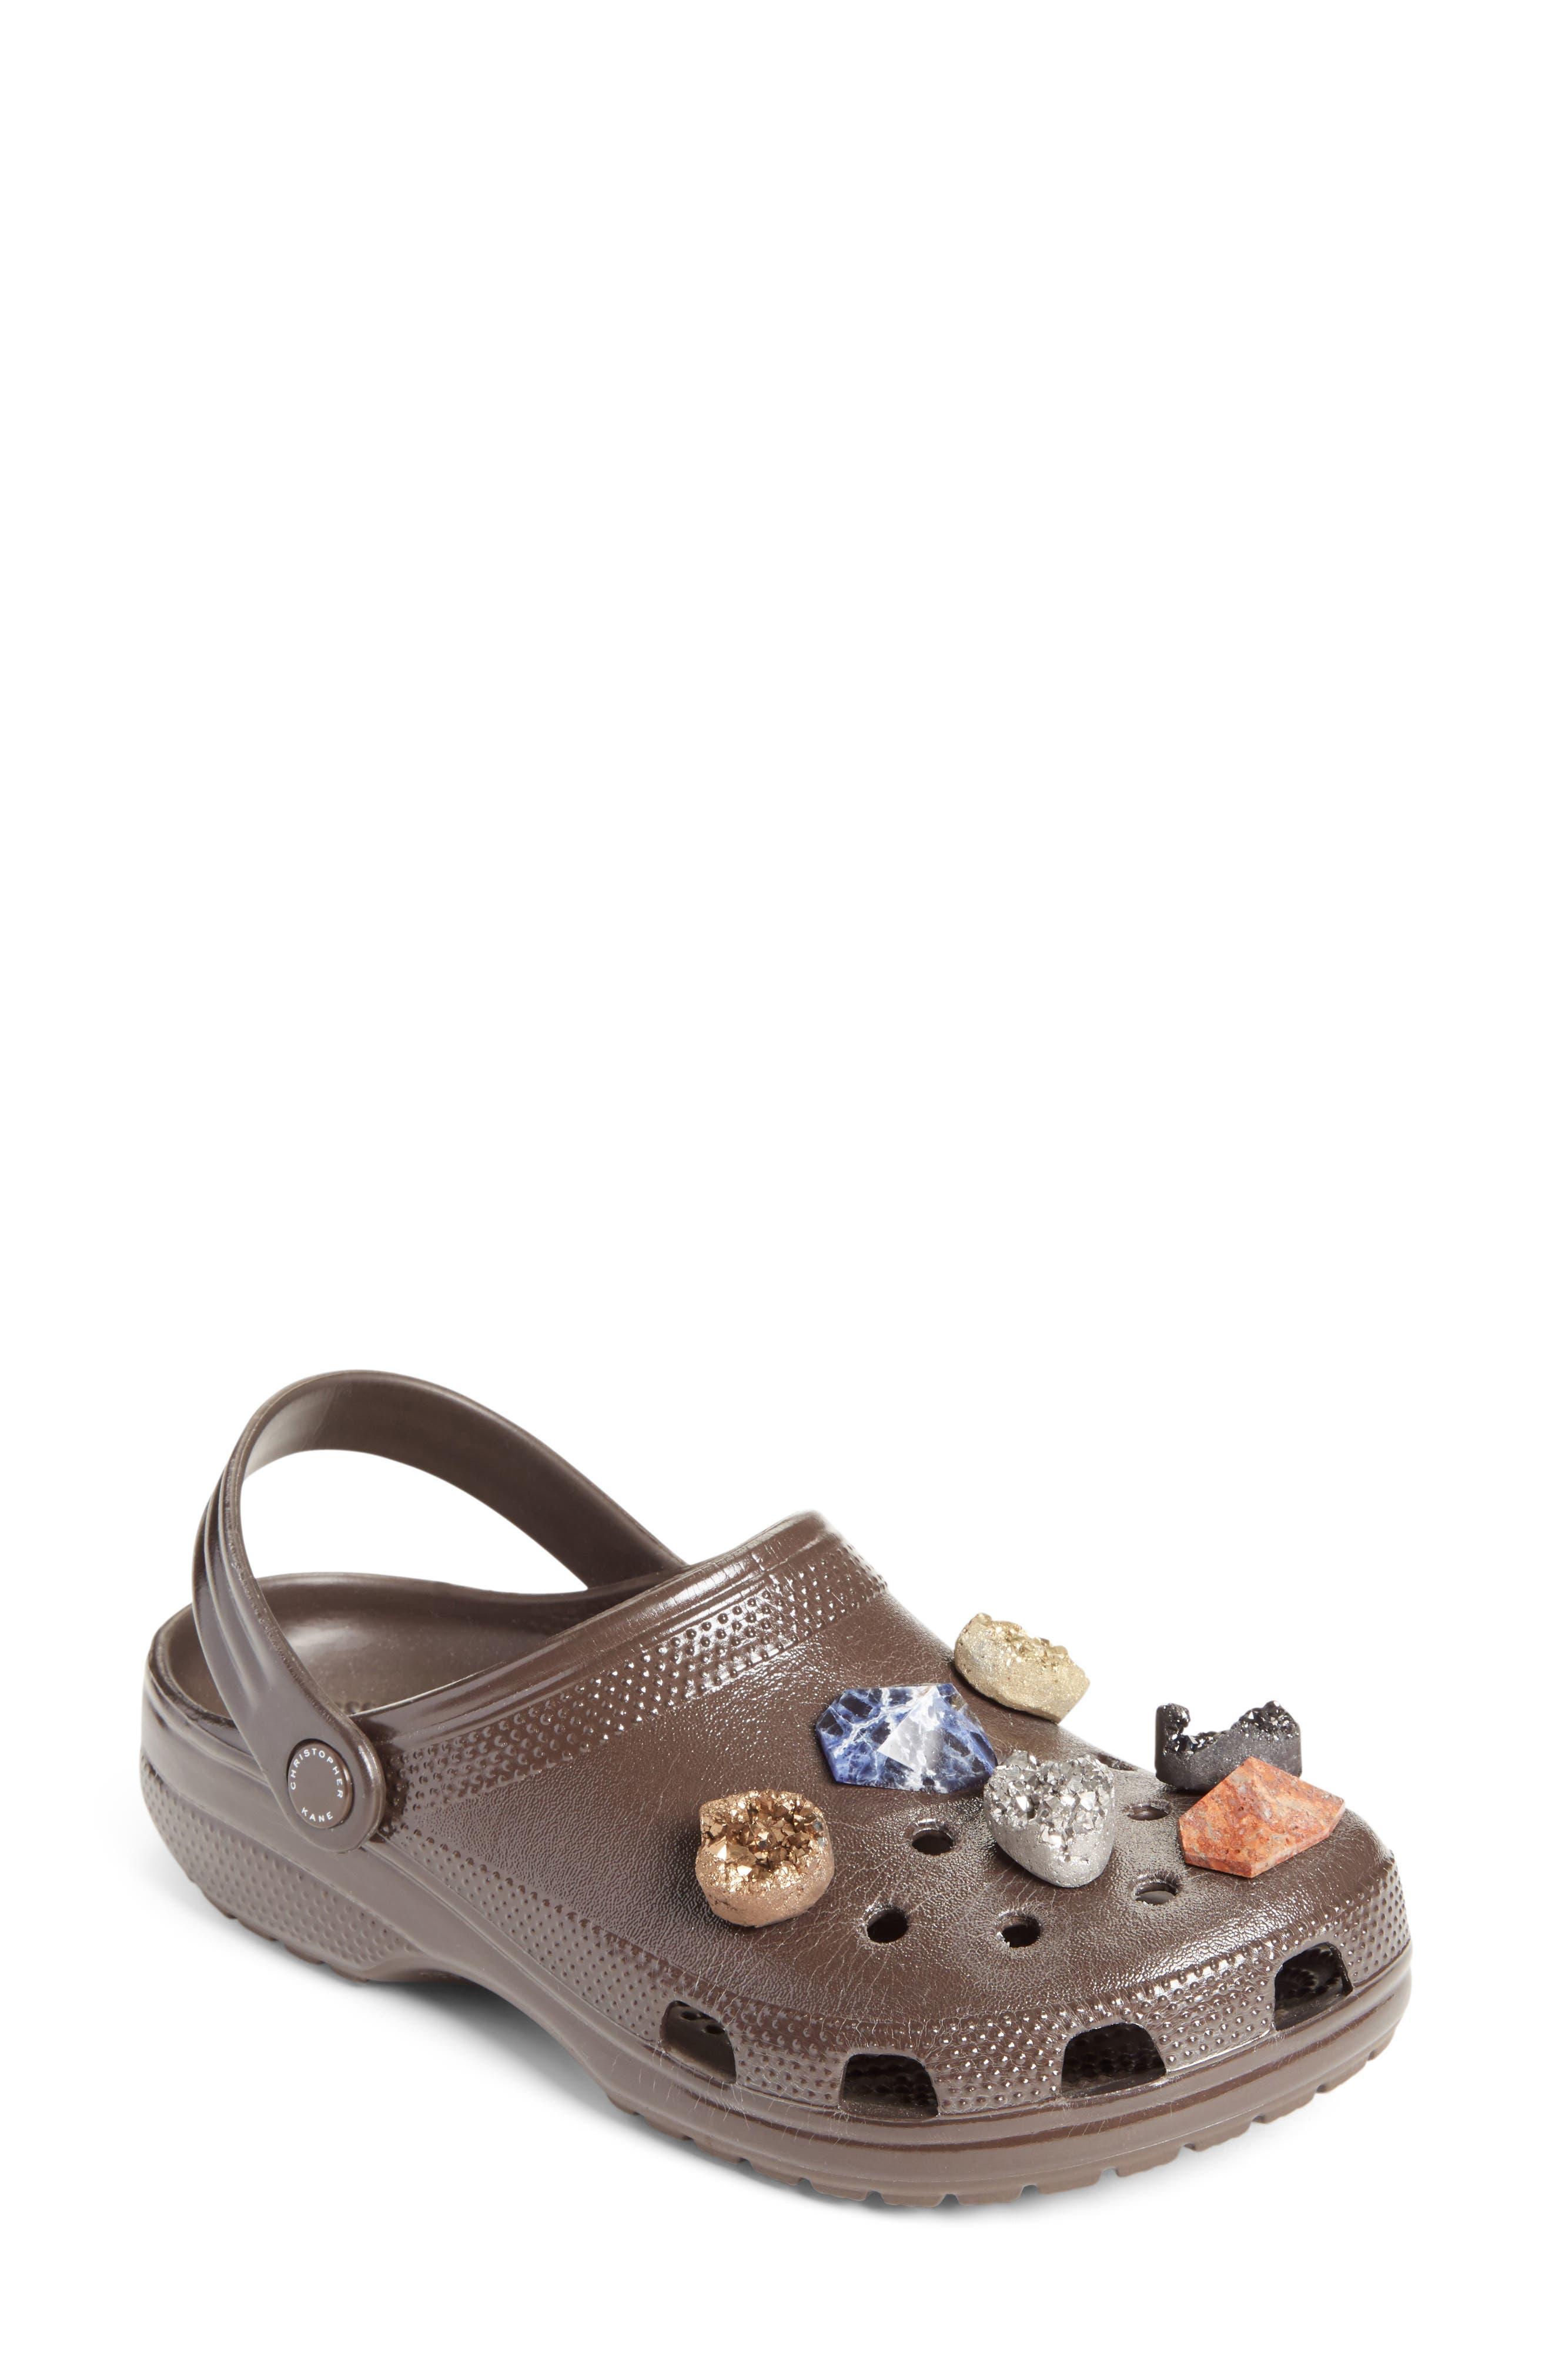 x CROCS<sup>™</sup> Multi Stone Clog Sandal,                         Main,                         color, 200